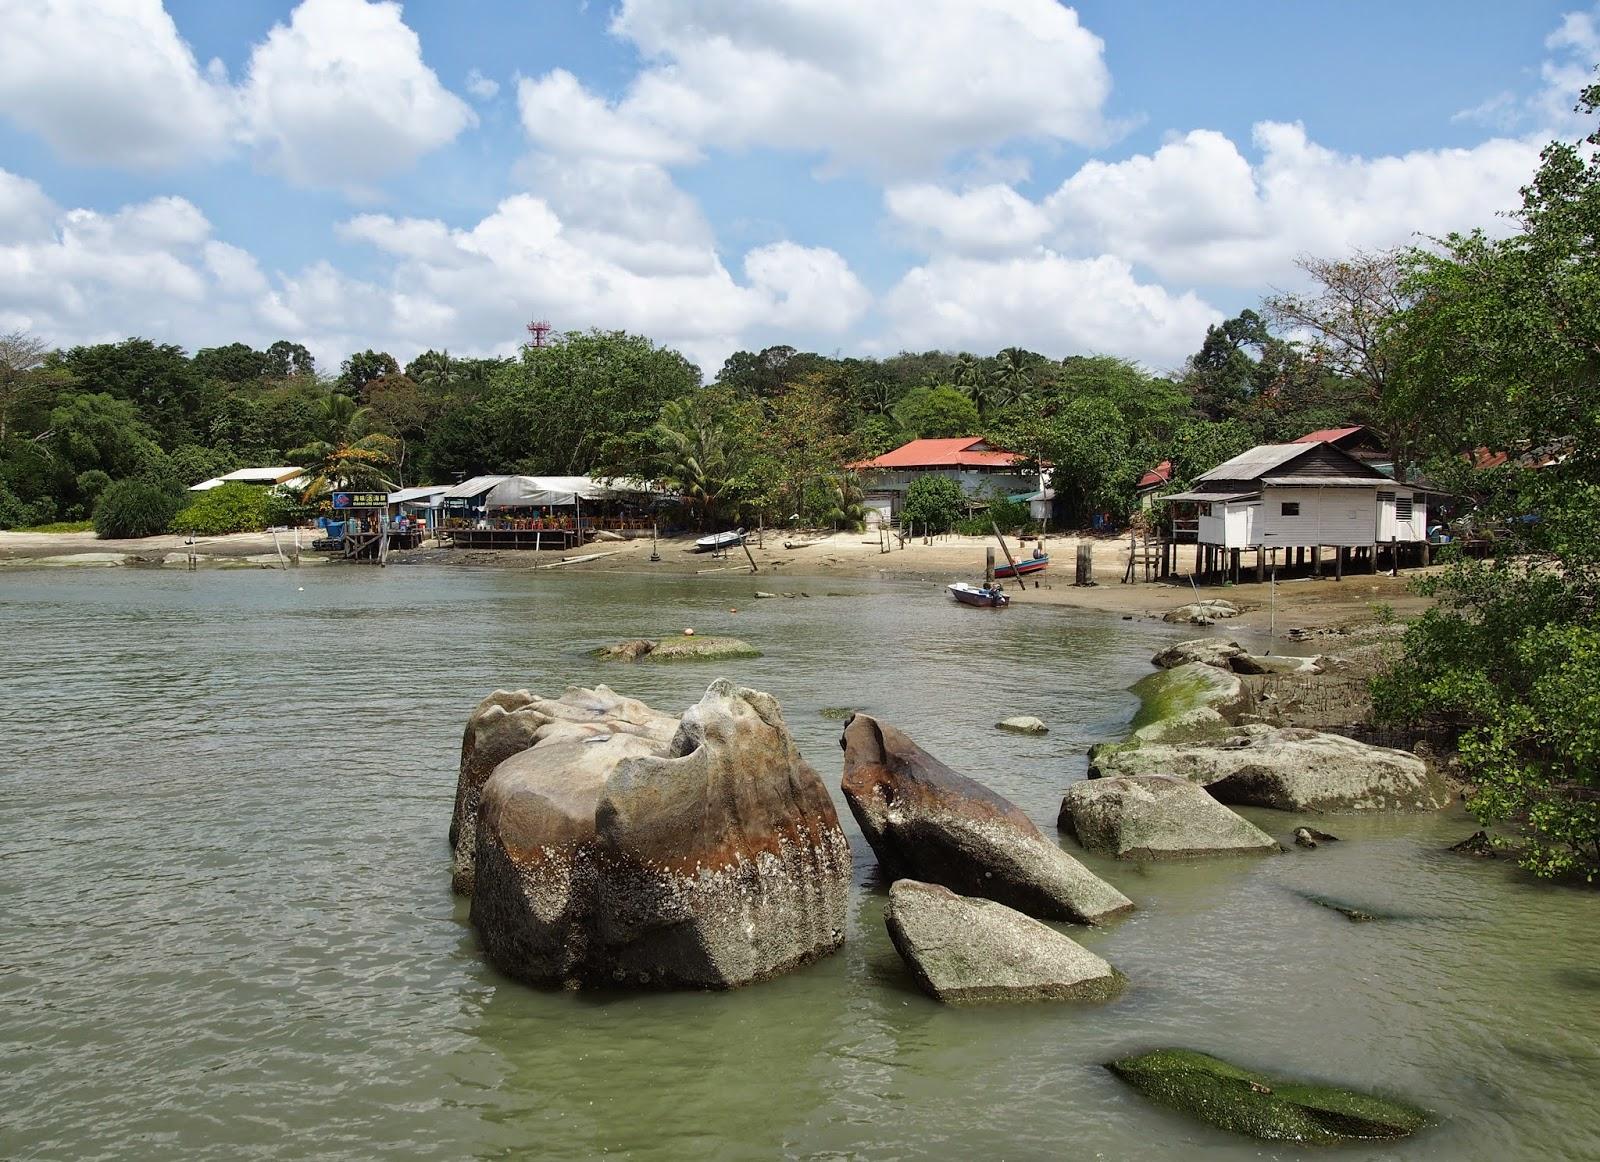 Pulau Ubin in Singapore